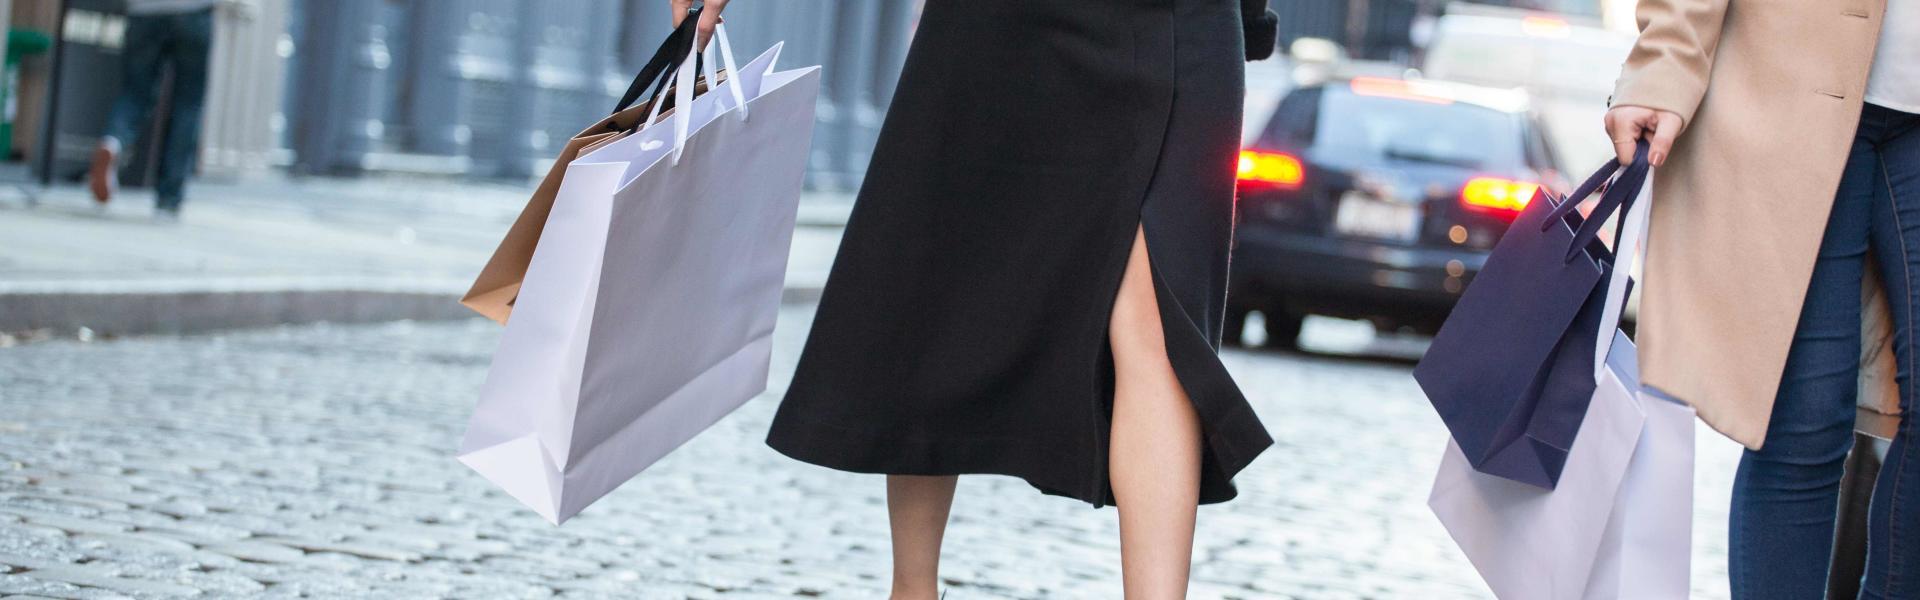 Soho Streets Shopping Bags